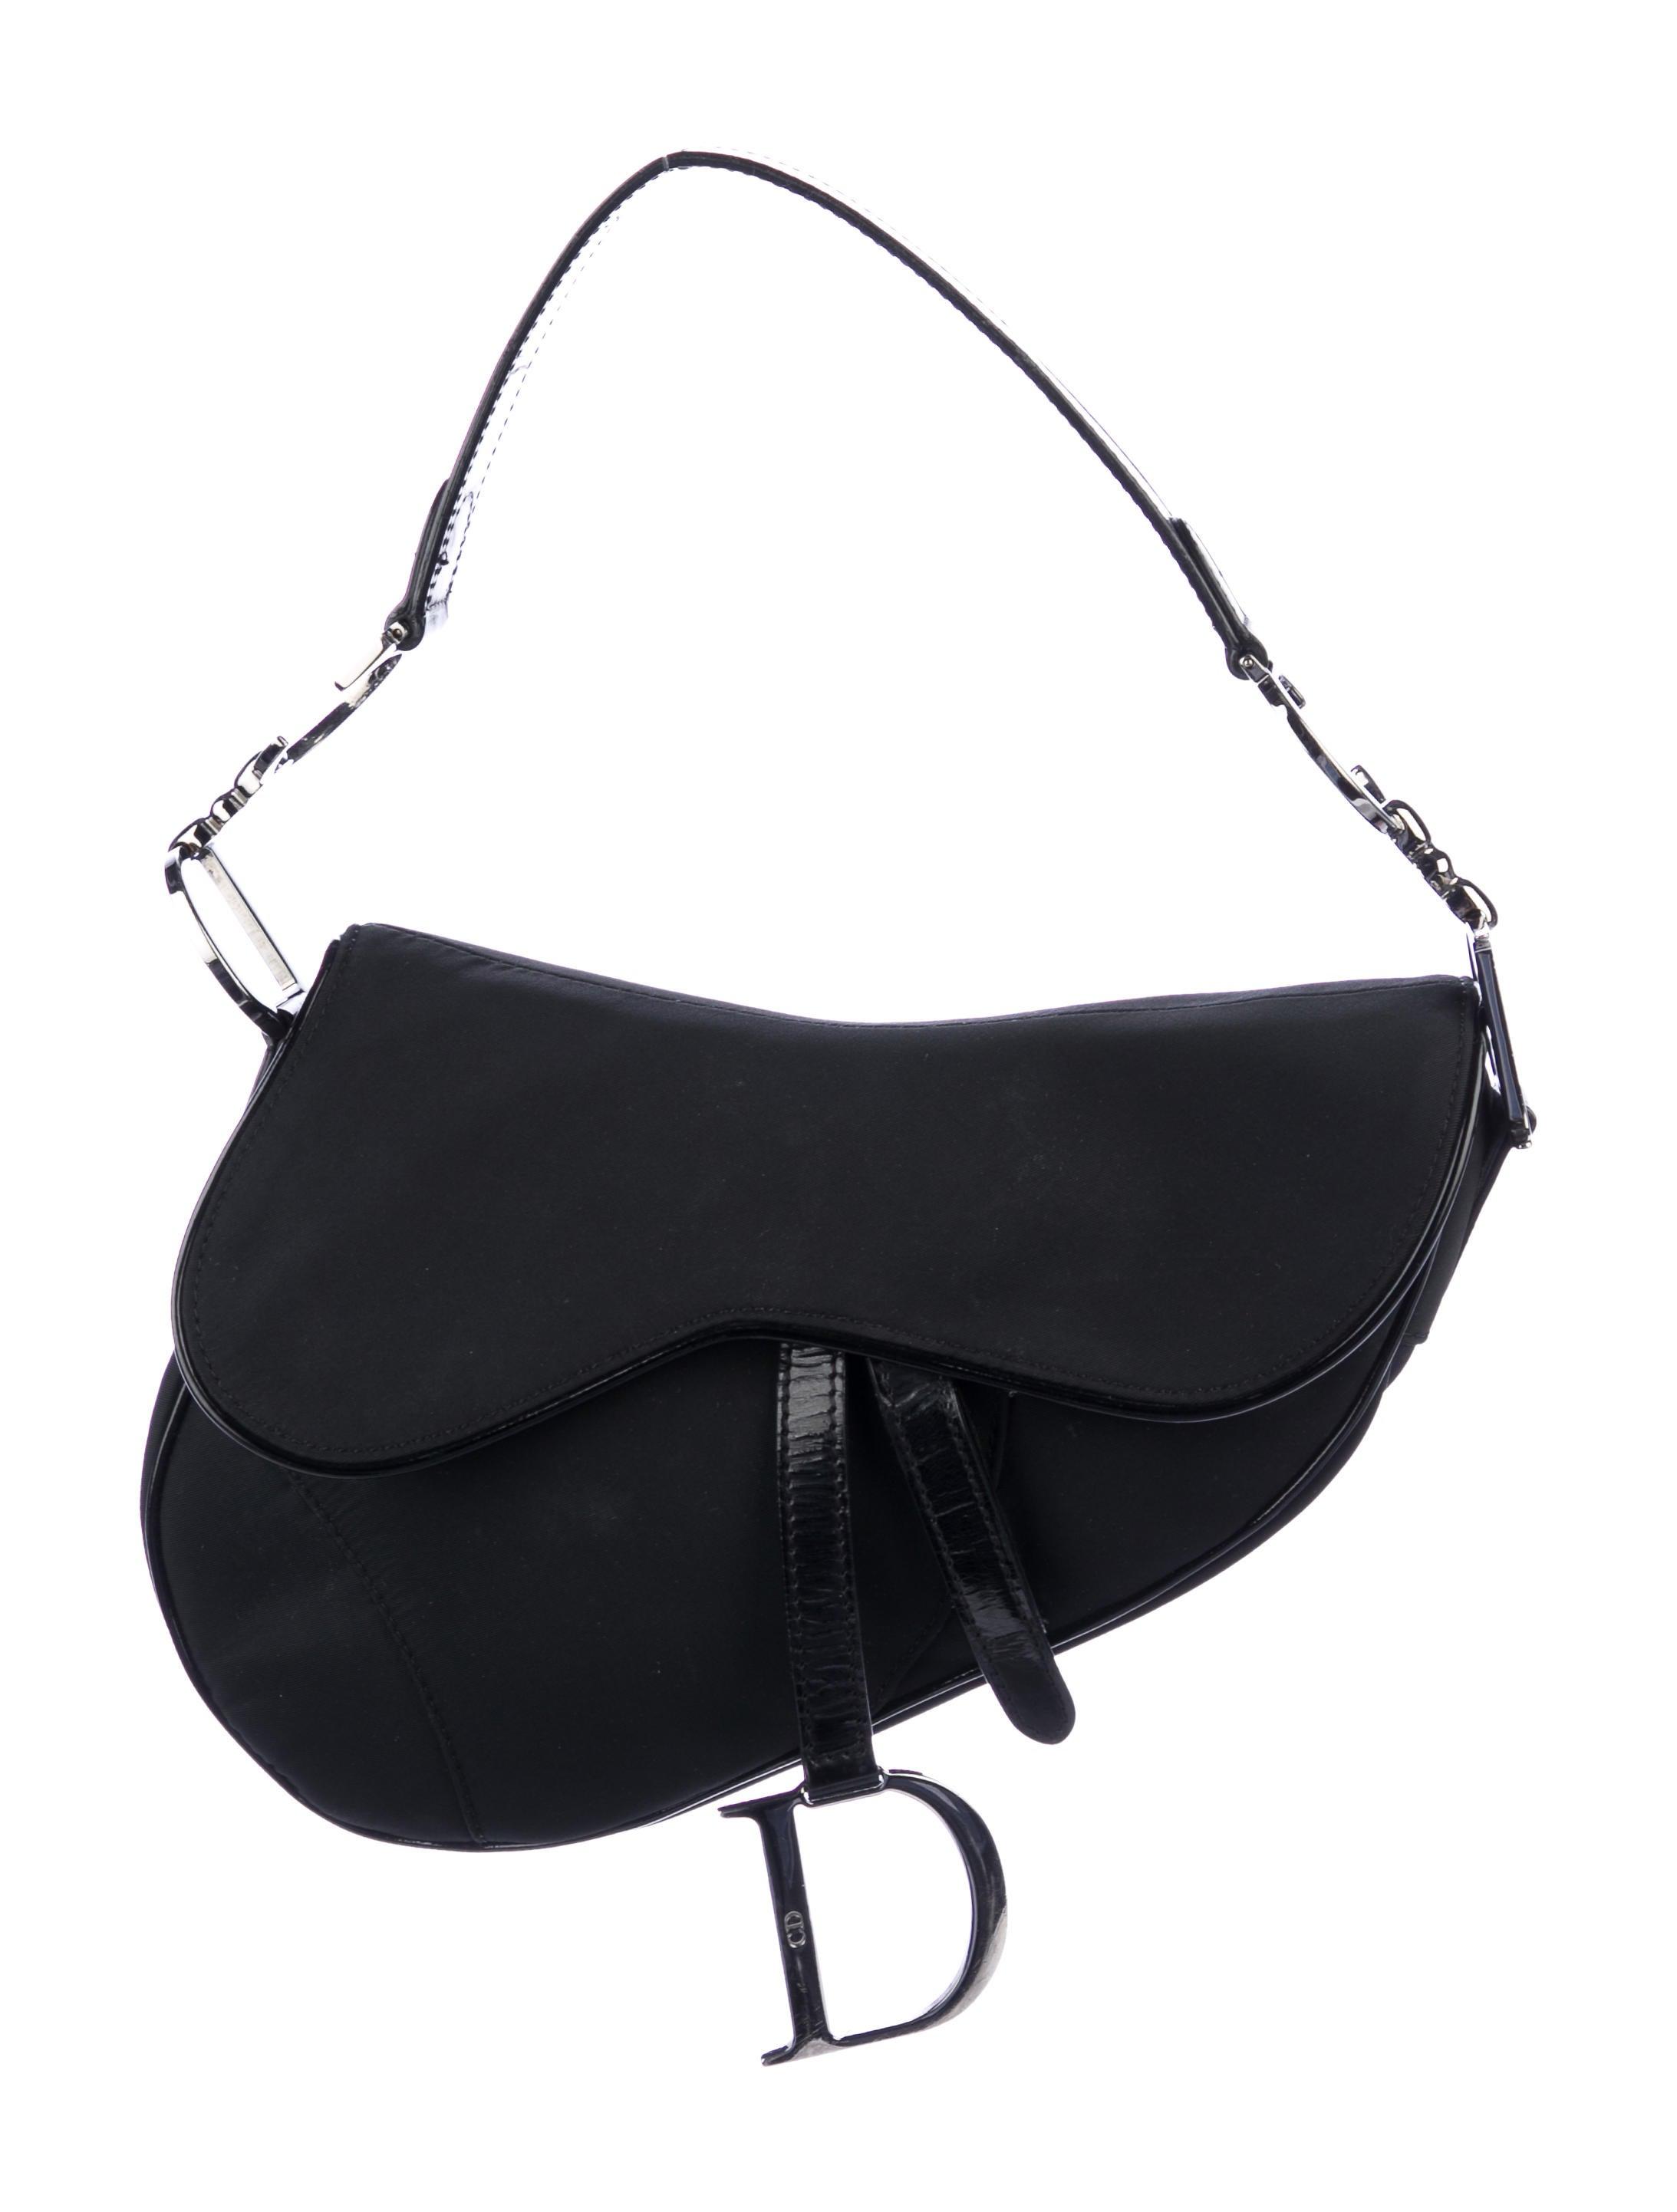 7b5c7d0f0817 Nylon Bag Christian Leather Dior Saddle Patent Trimmed waqTU for ...